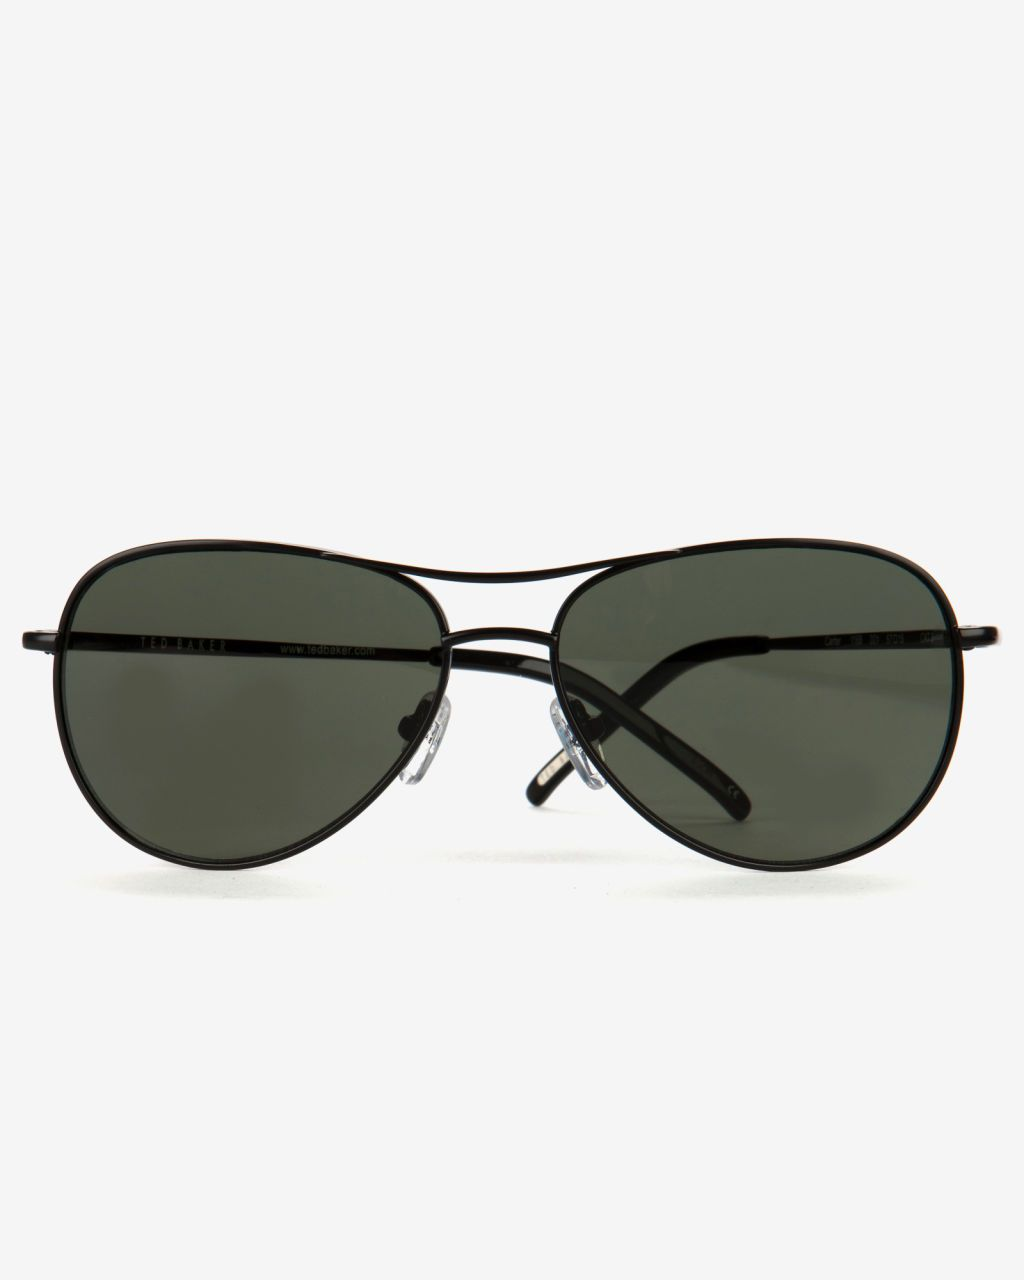 uk-mens-accessories-sunglasses-carter-aviator-sunglasses-black-xs5w_carter_00-black_1.jpg